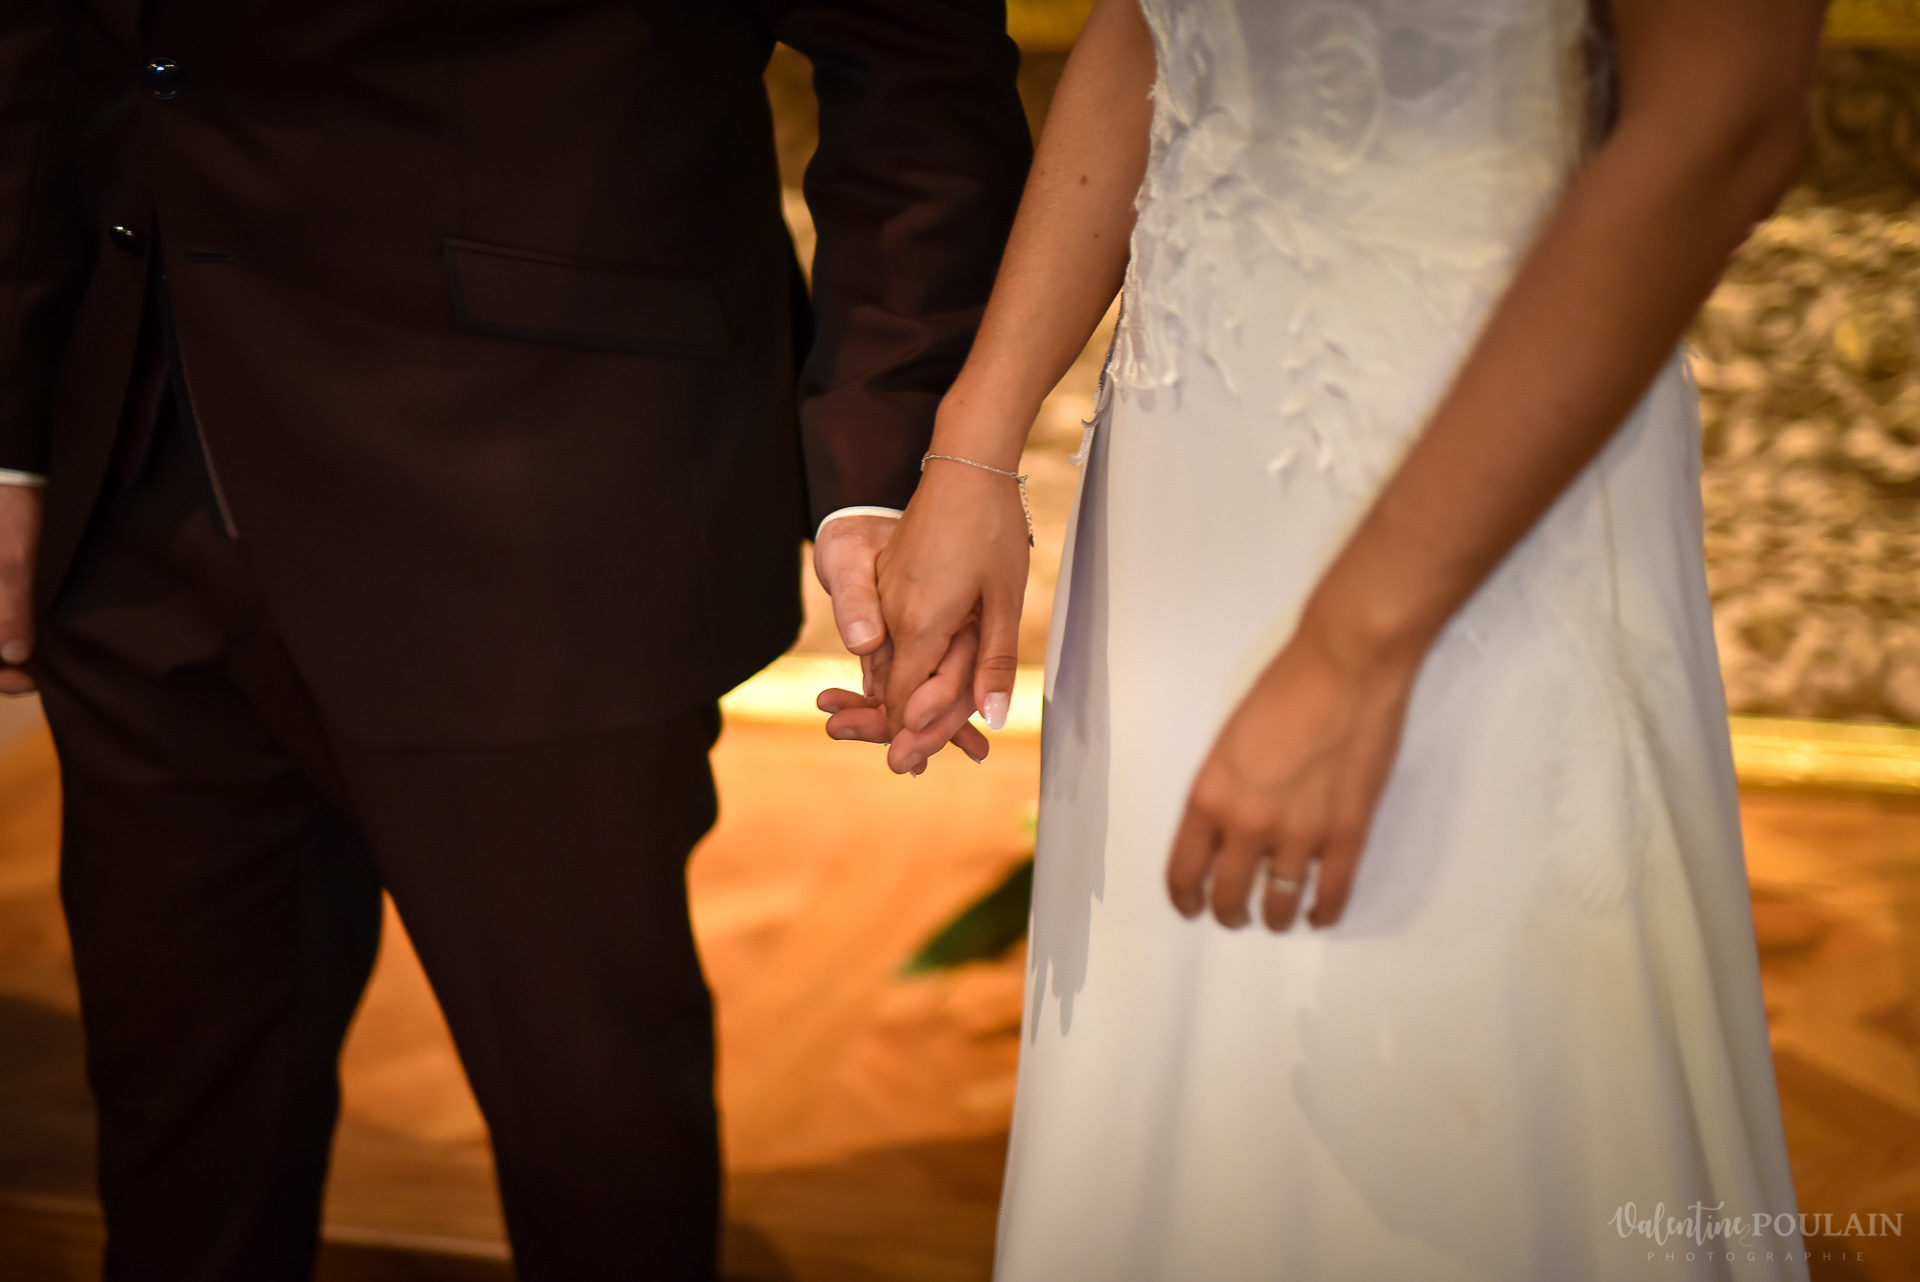 Mariage convivial Saverne - Valentine Poulain mains